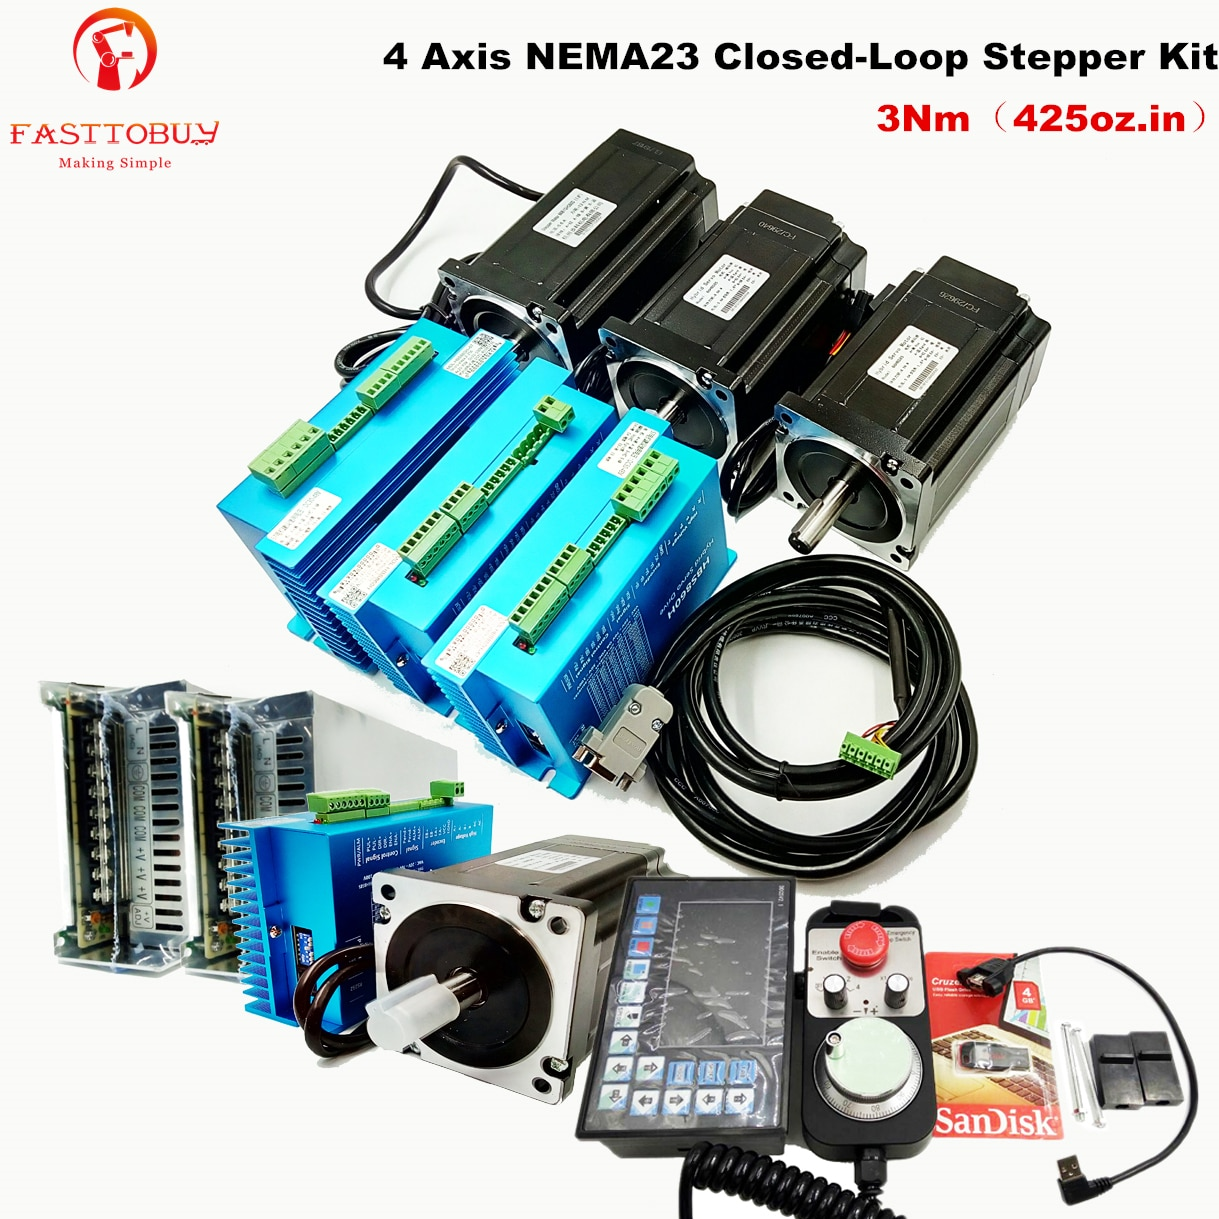 4 Axis NEMA23 3Nm 425oz.in Closed-Loop Stepper Kit Stepper Drive+Motor+DDCSV2.1 Offline Controller+Handwheel+Power Supply set